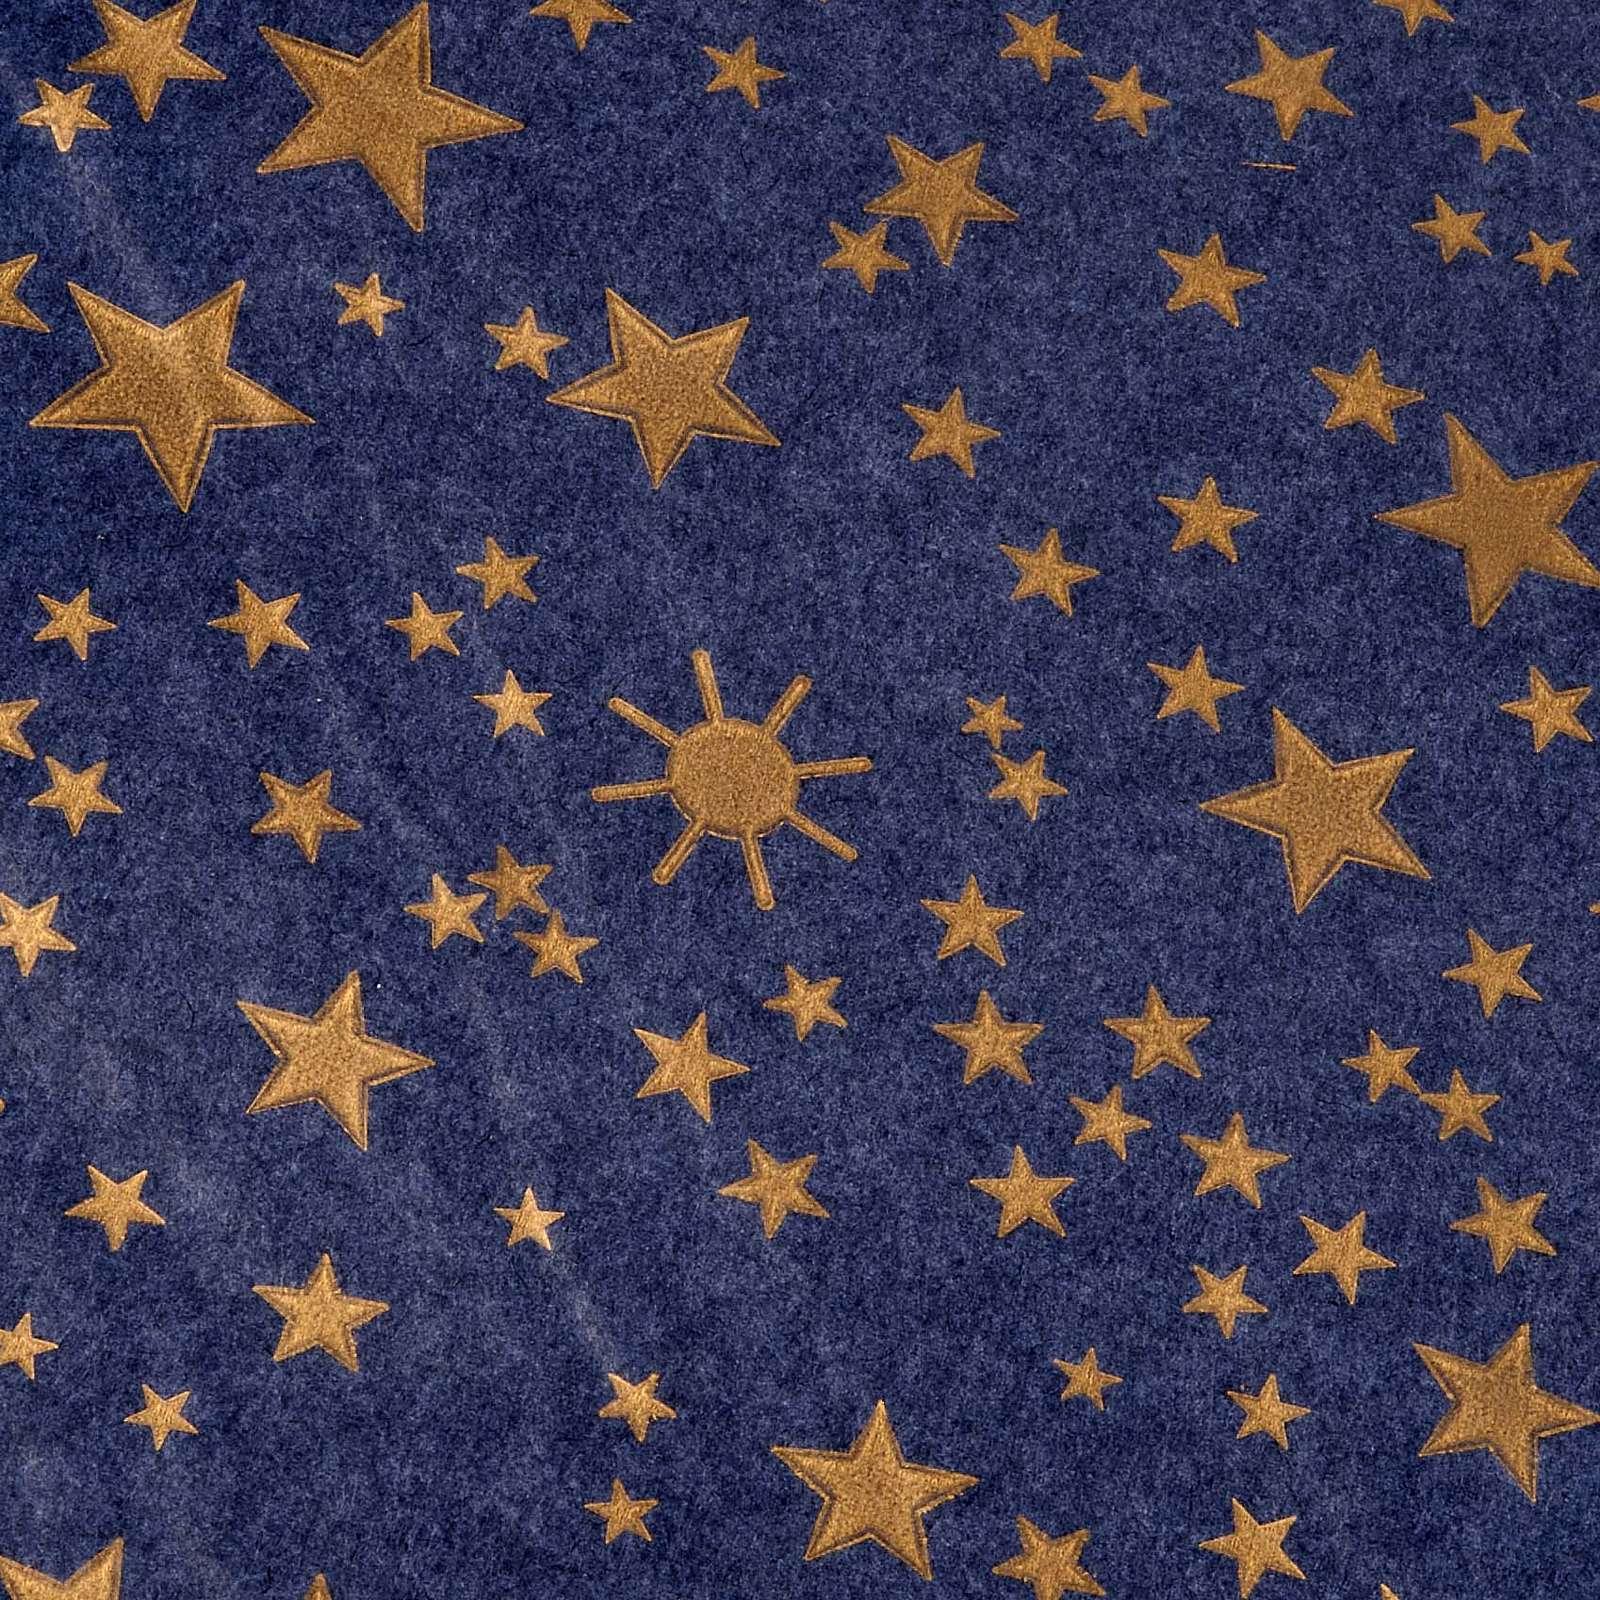 Papier Himmel mit Sternen 70x100cm 4